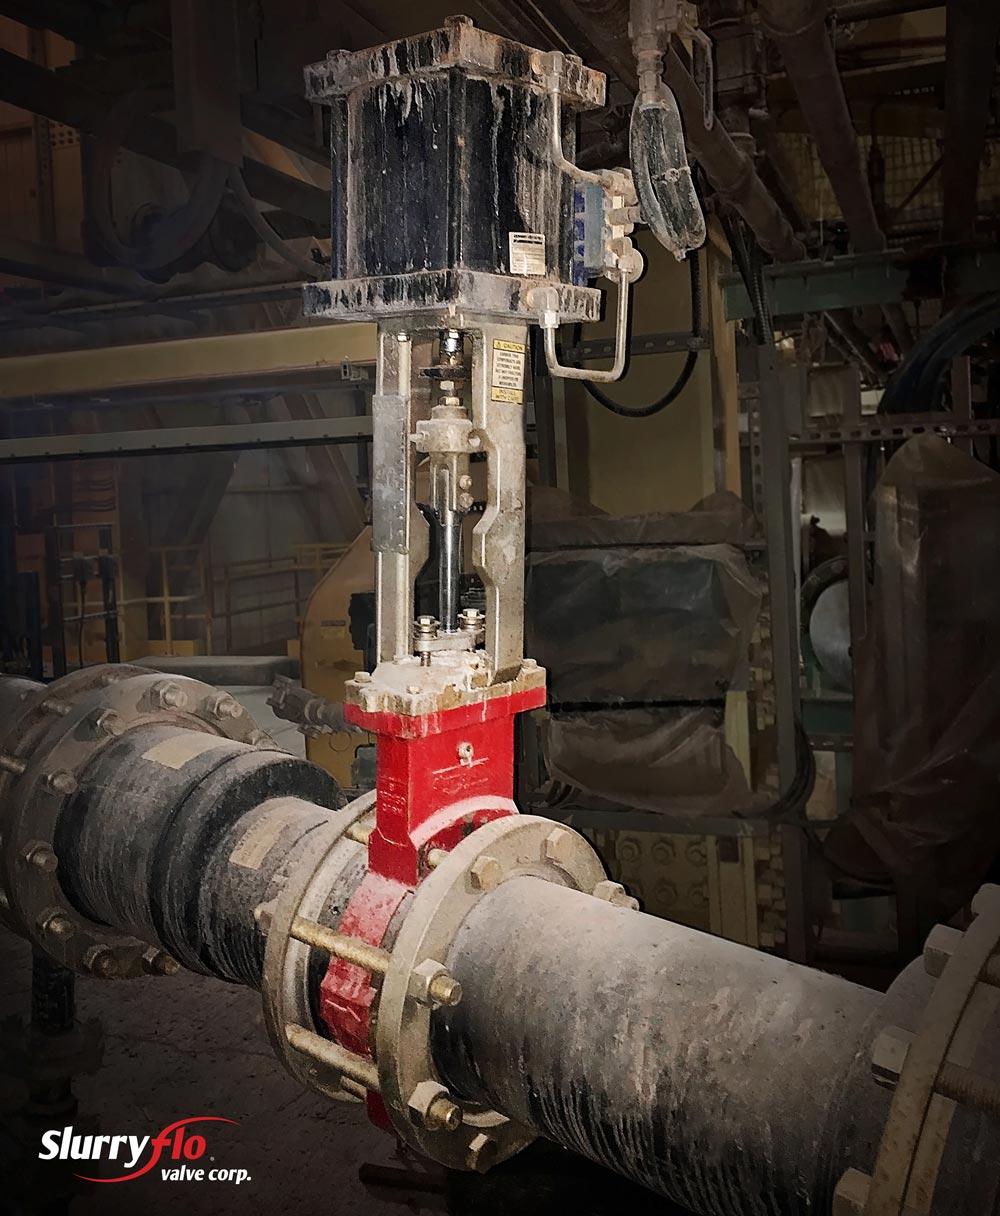 Severe Service Control Valve in Potash Industry